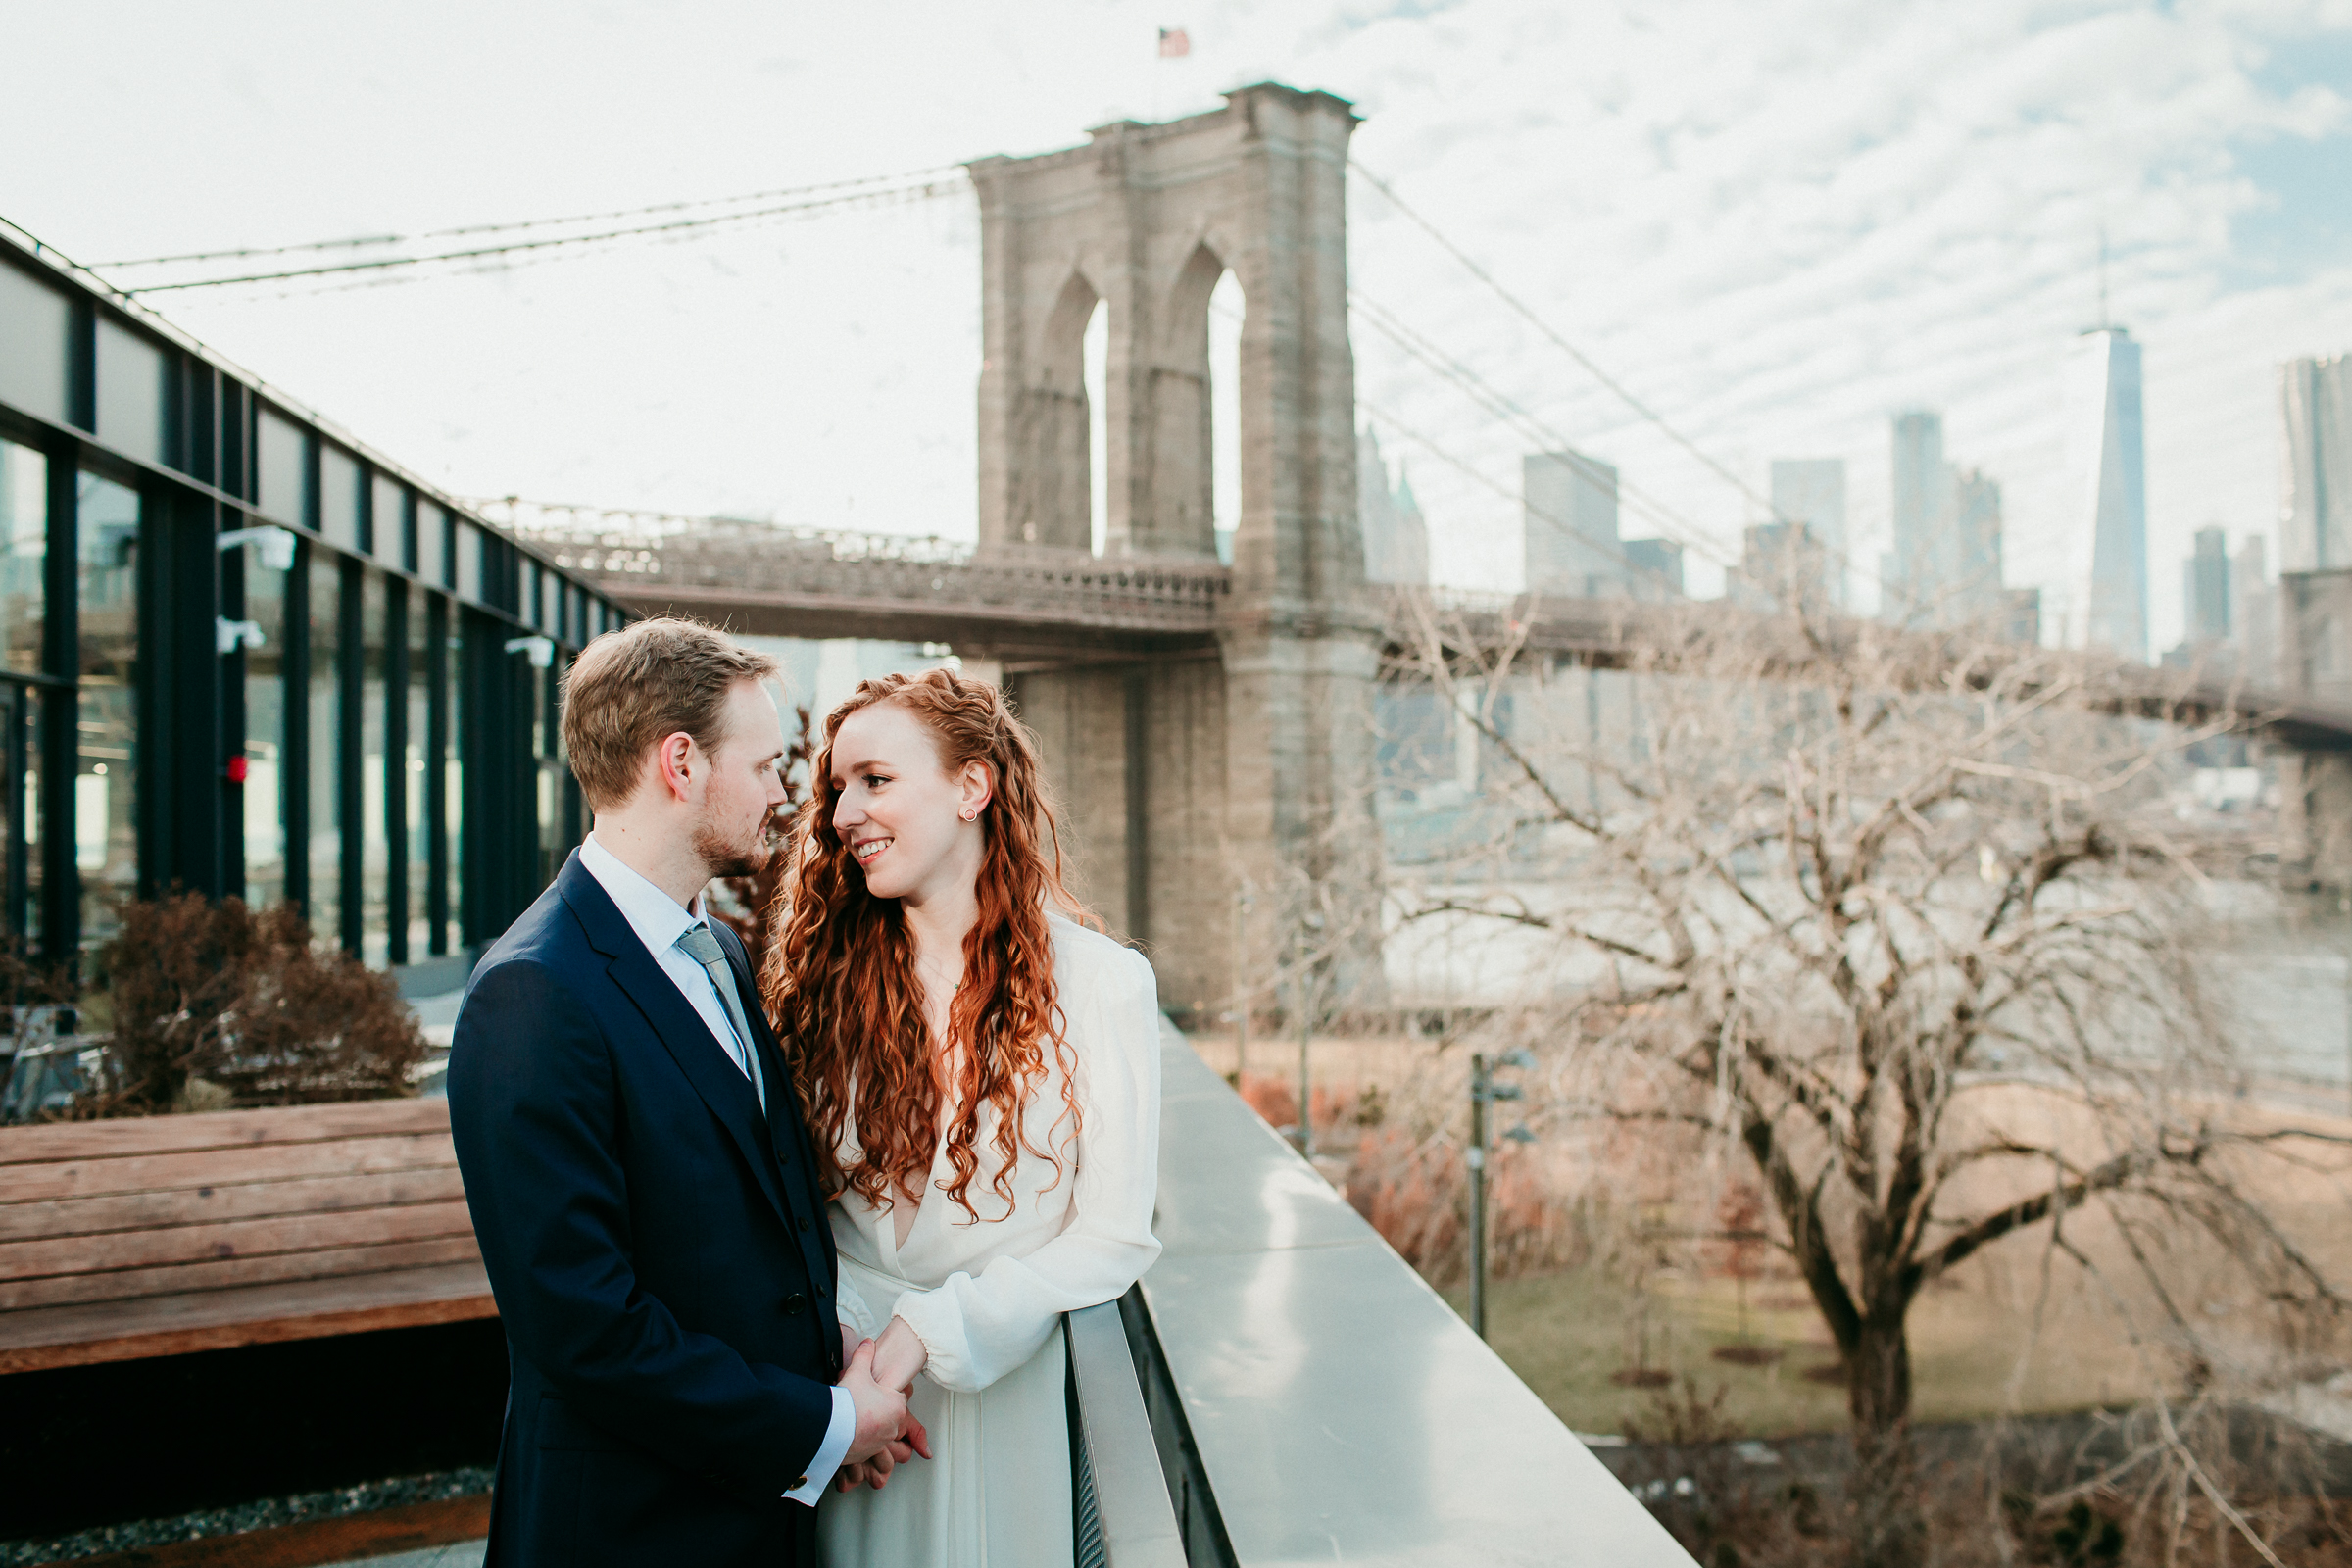 Freemans-Restaurant-Soho-Brooklyn-Bridge-Park-Dumbo-Documentary-Wedding-Photographer-12.jpg